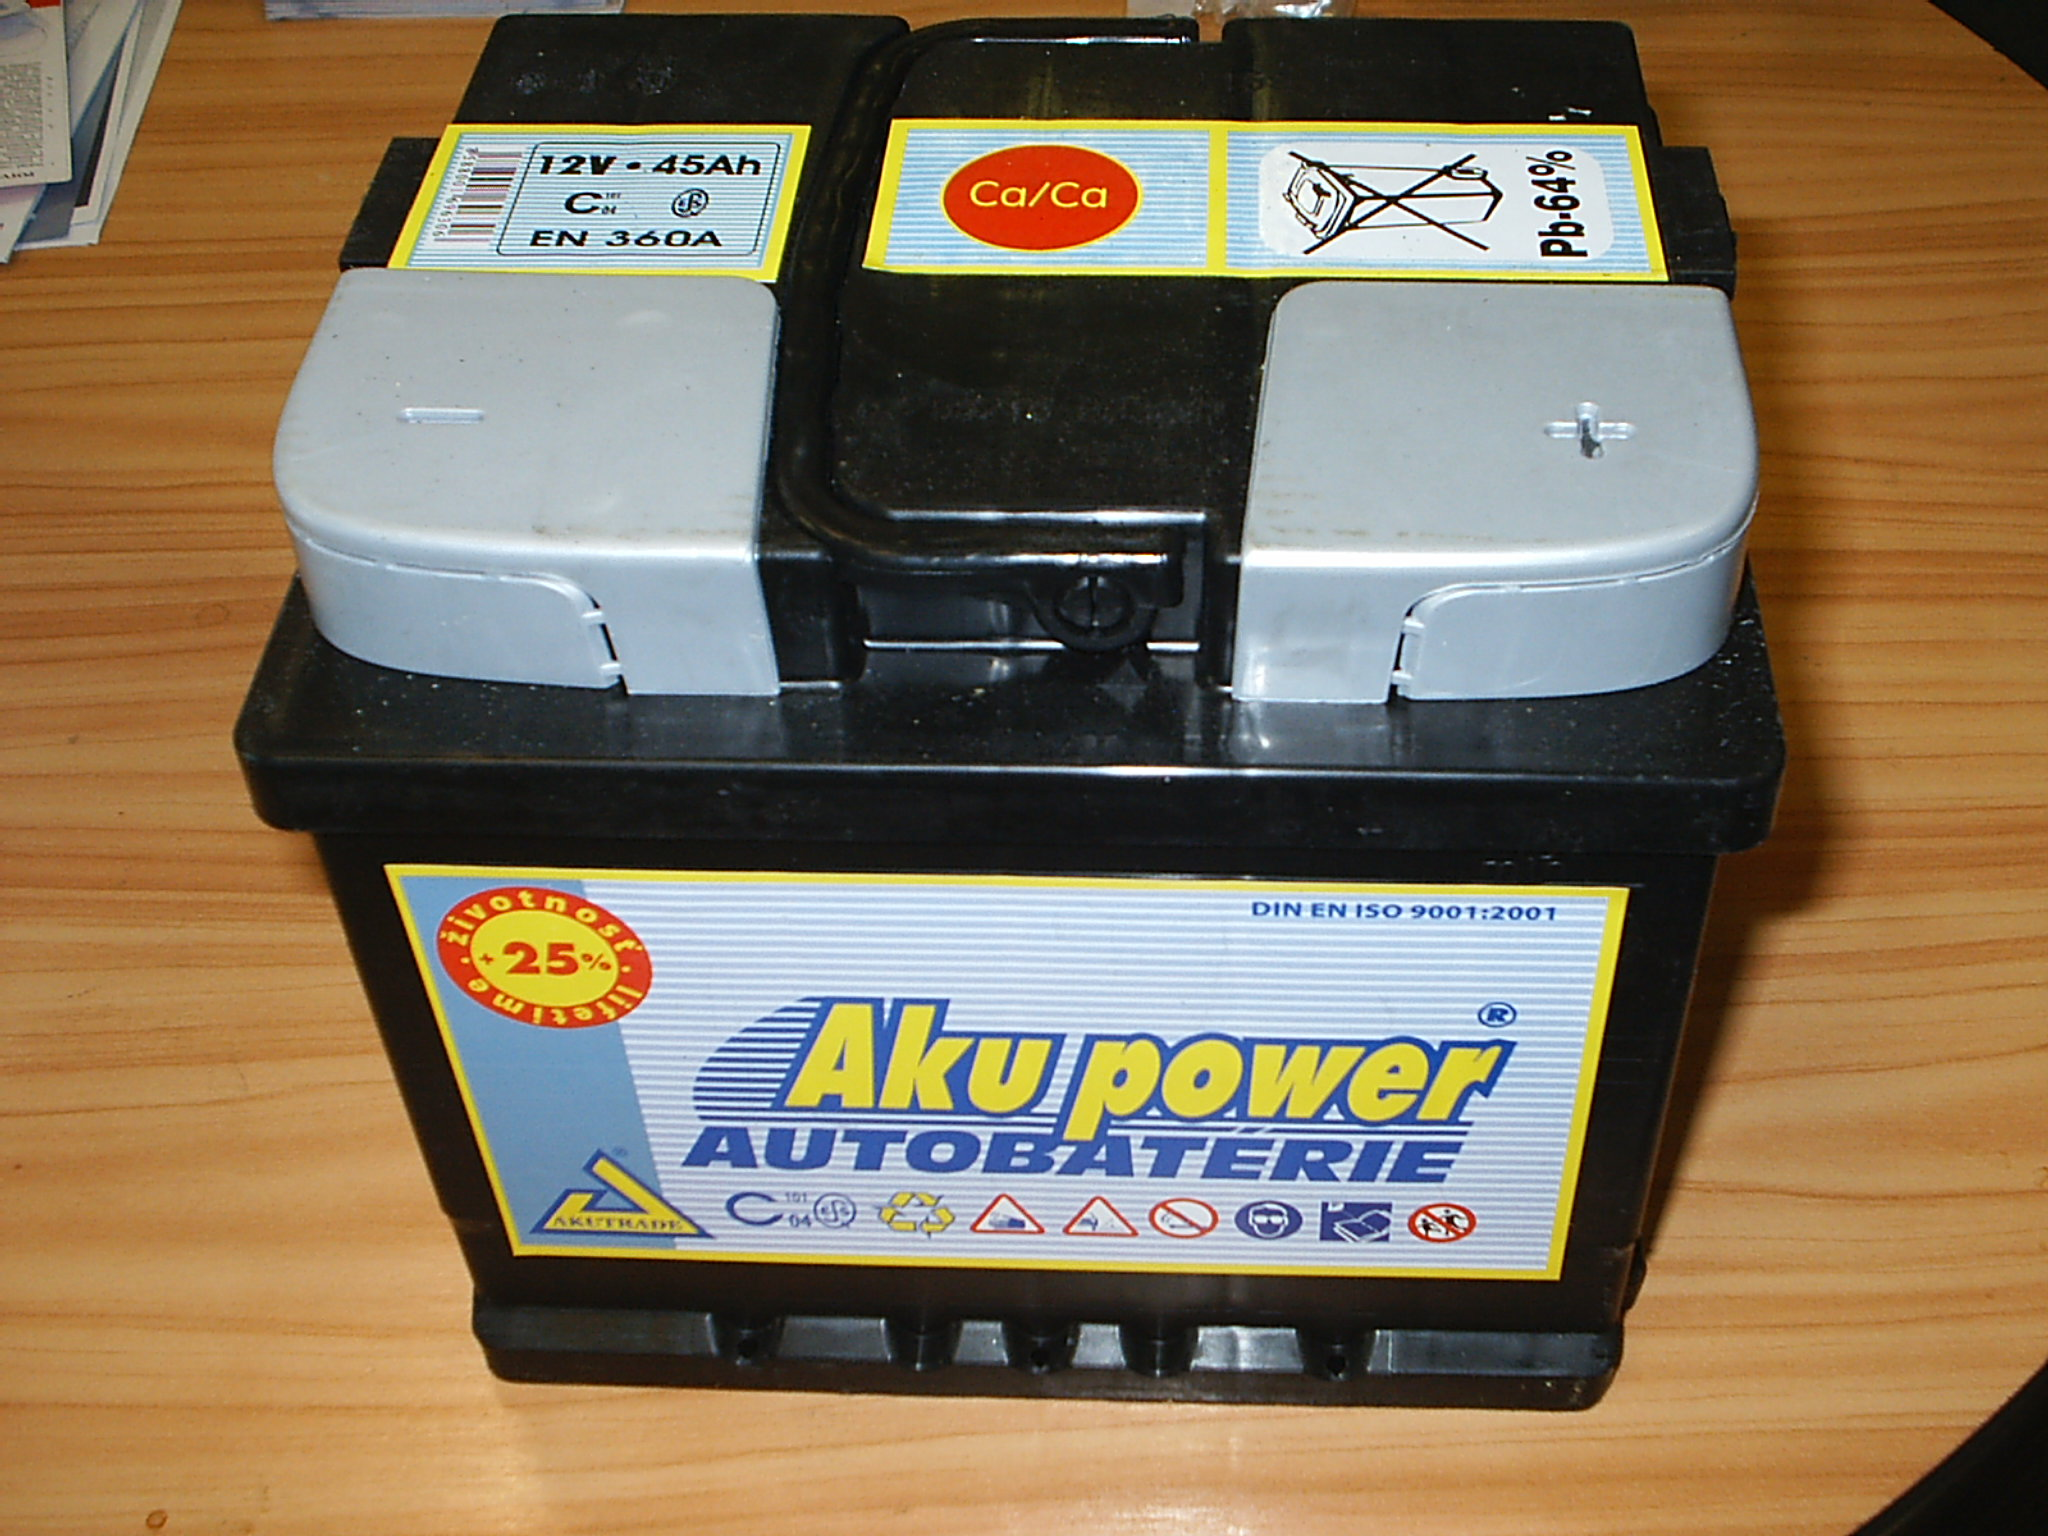 Autobaterie Akupower 45AH.....................998,- Kč s DPH